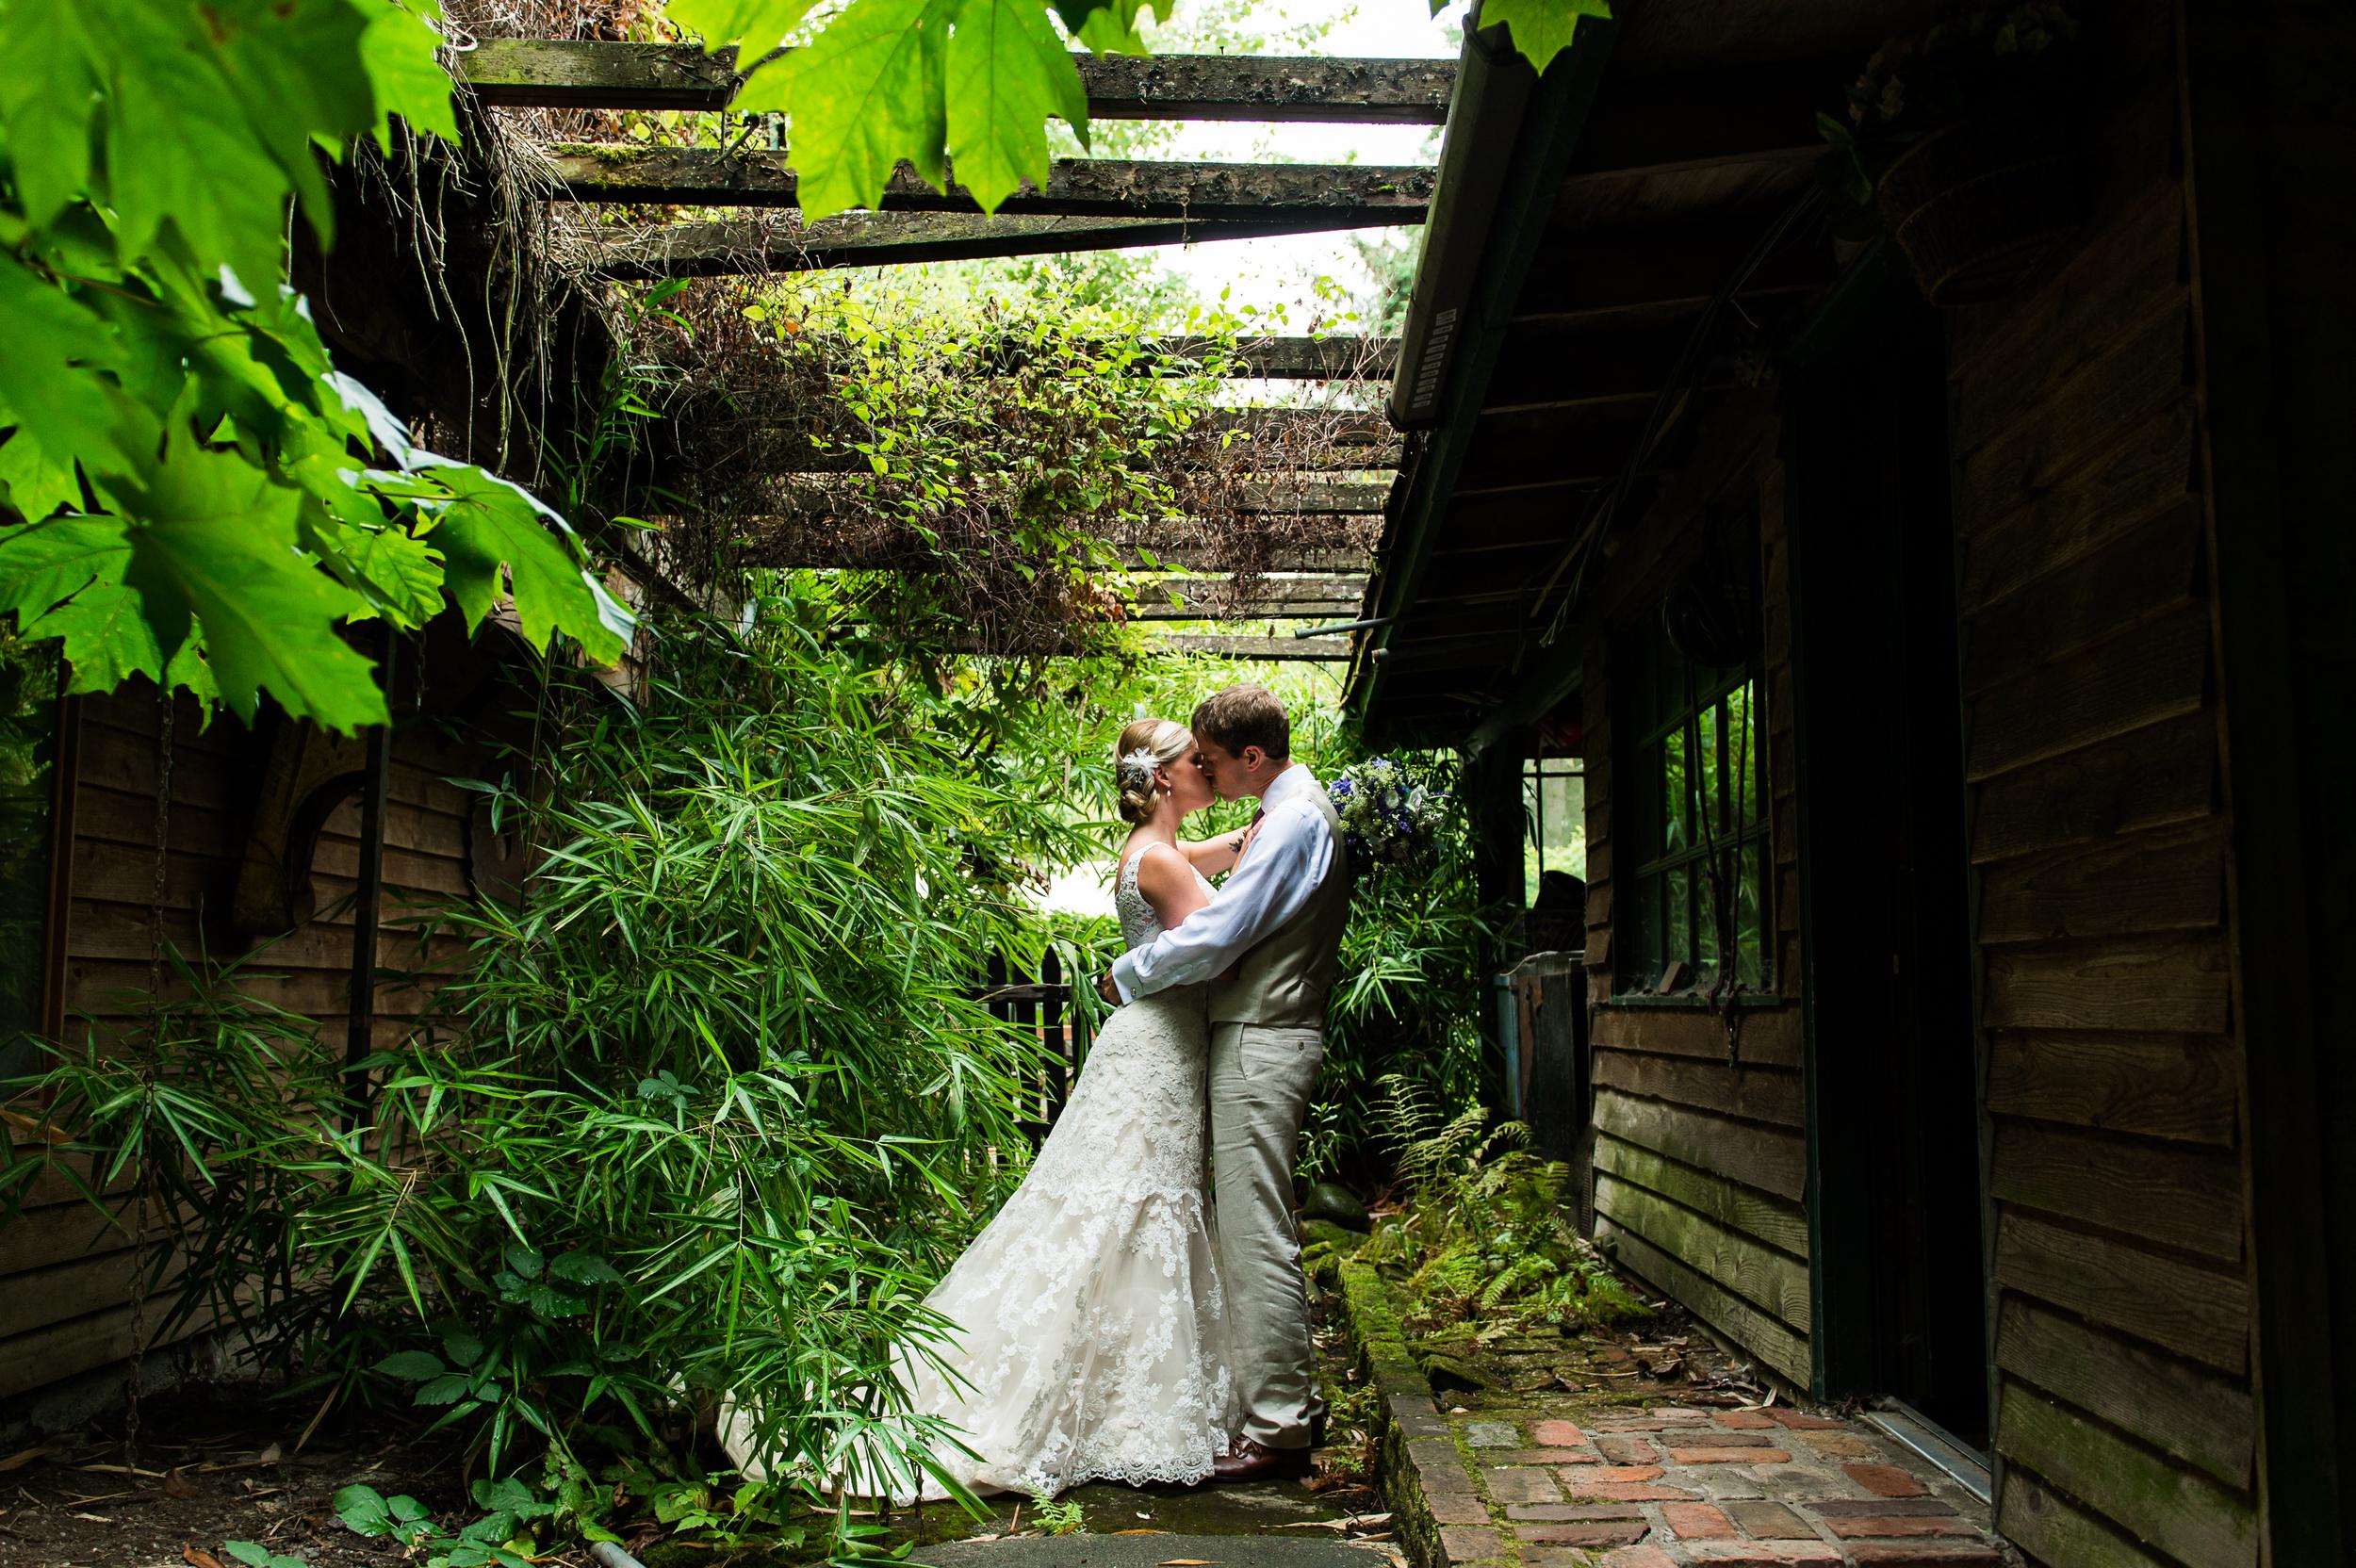 JJ-wedding-Van-Wyhe-Photography-230.jpg